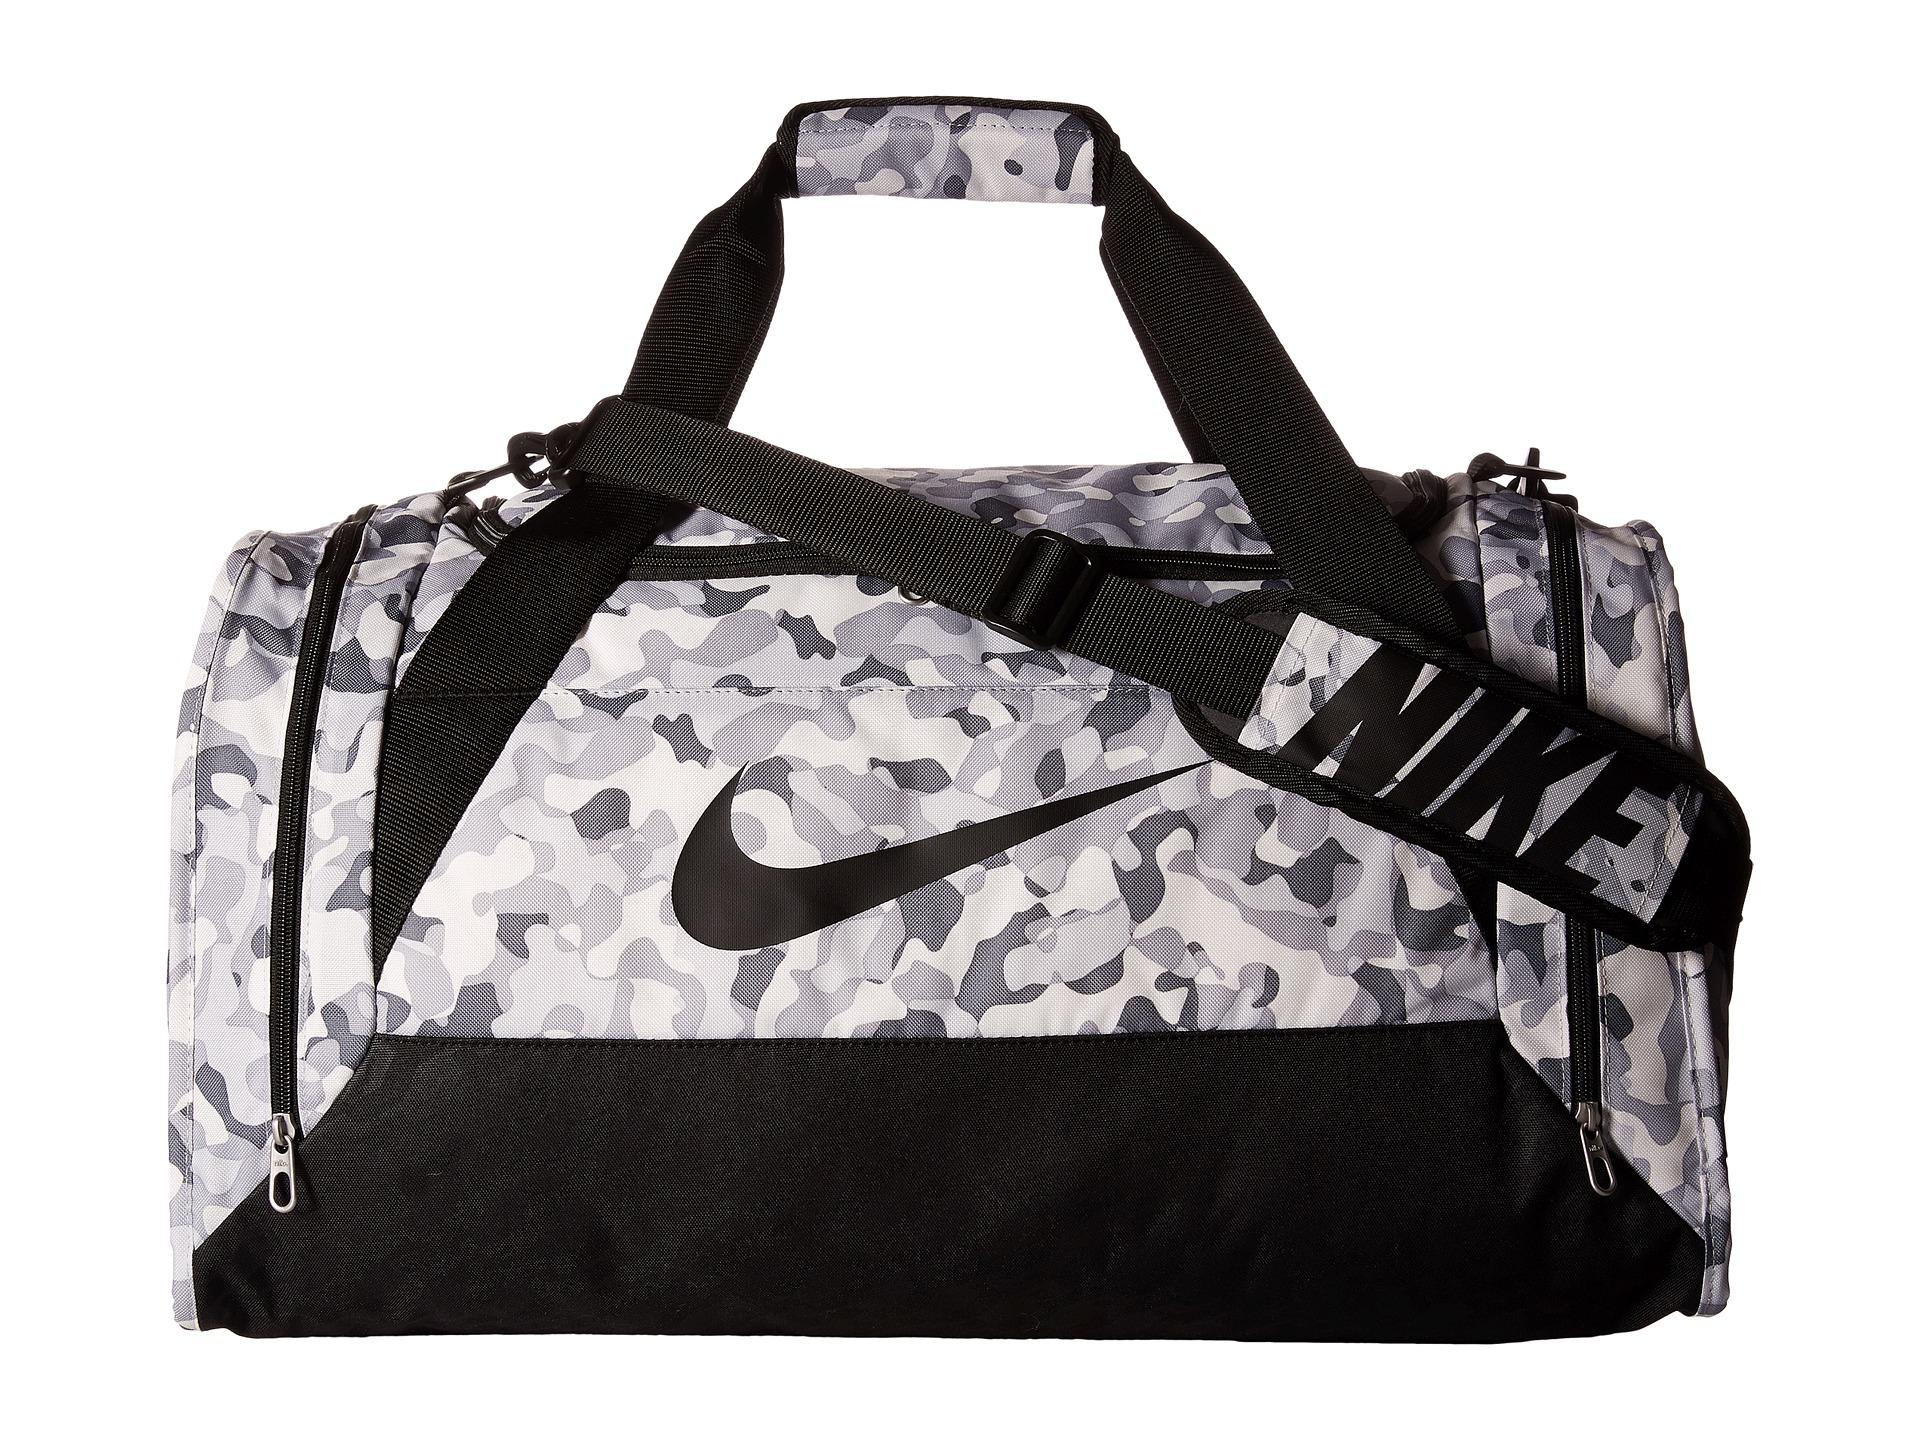 90354b7040c8e Nike Brasilia 6 Duffel Graphic Medium for Men - Lyst